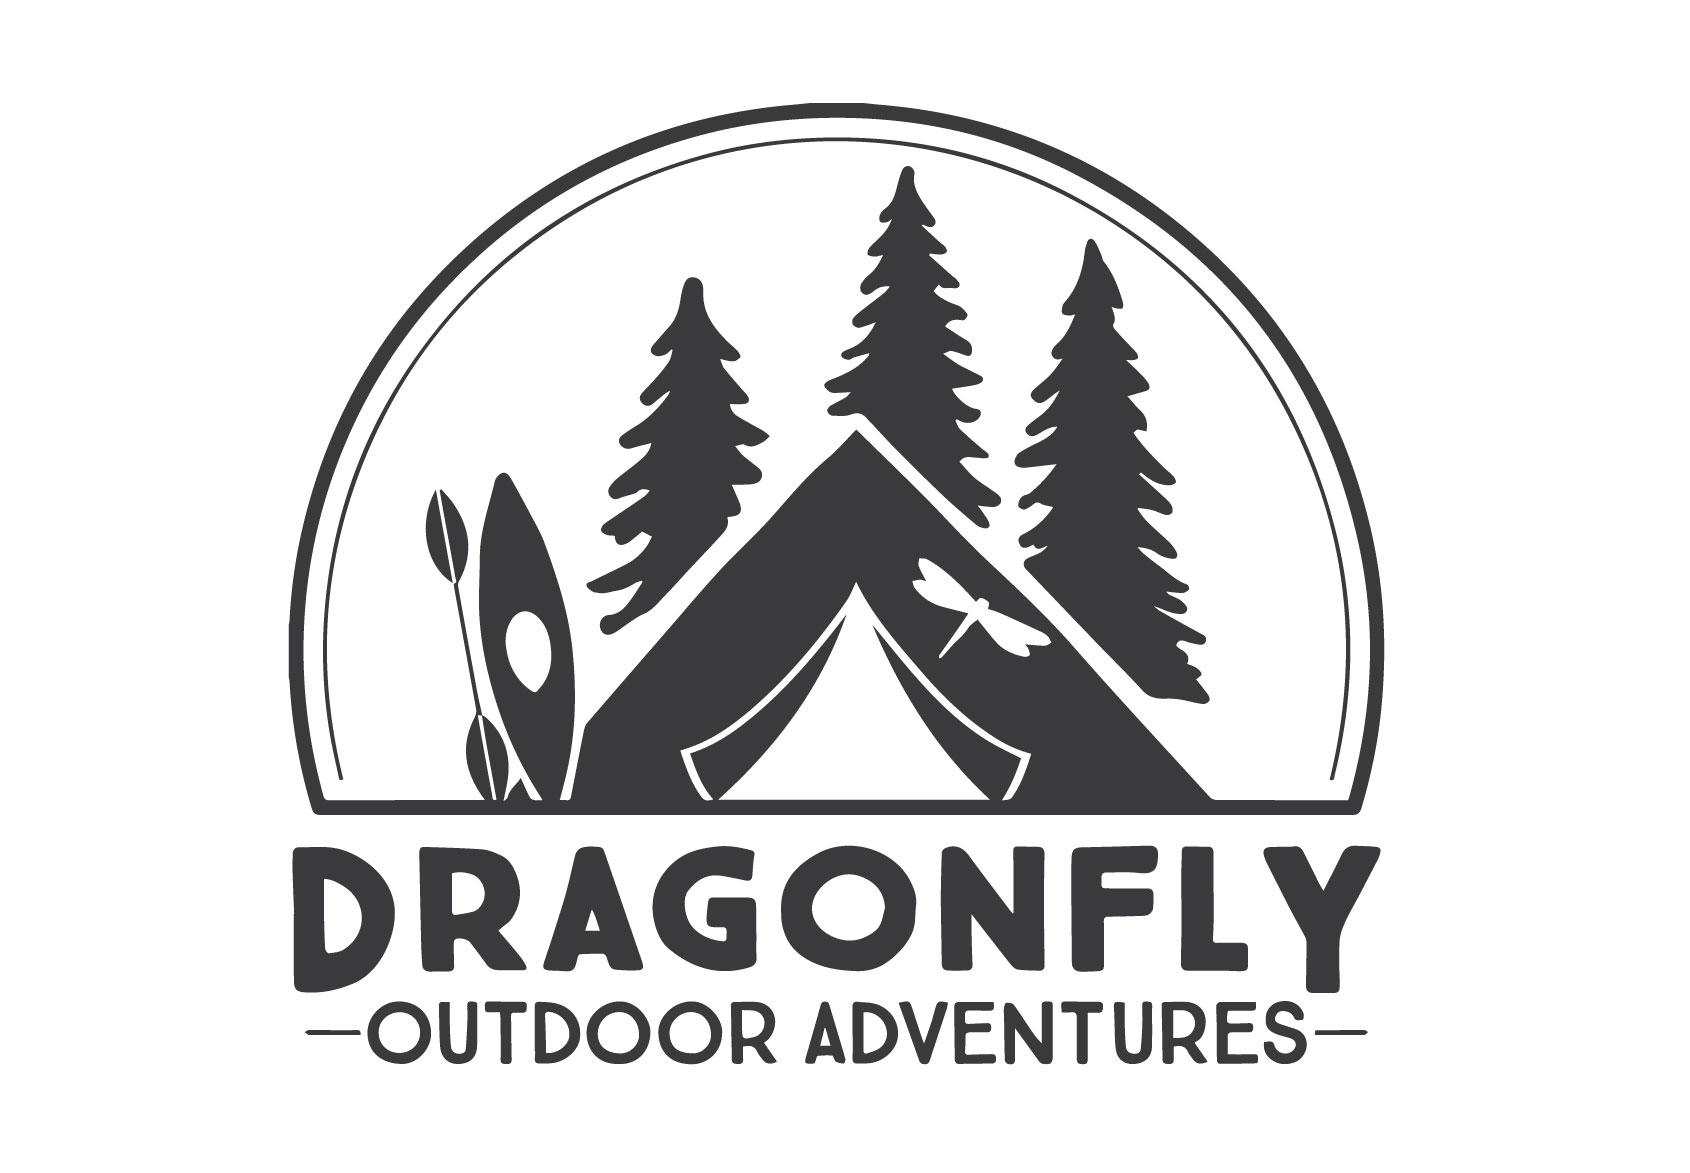 DragonflyOutdoors-01.jpg